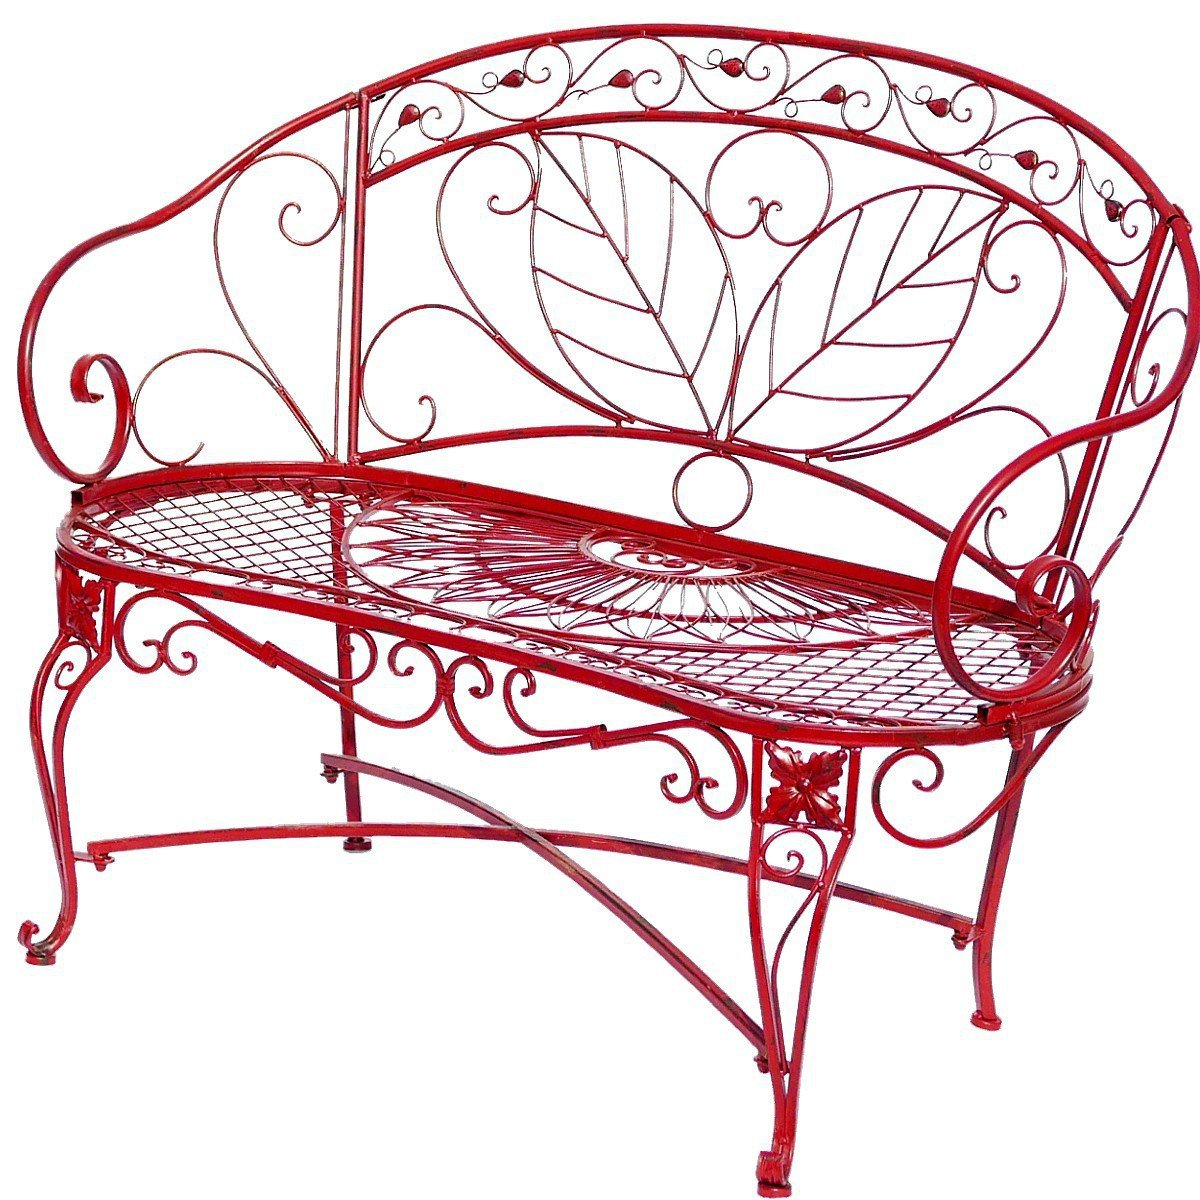 Sitzbank Gartenbank 2er rote Bank mit Blattmuster Terasse Vorgarten Metall